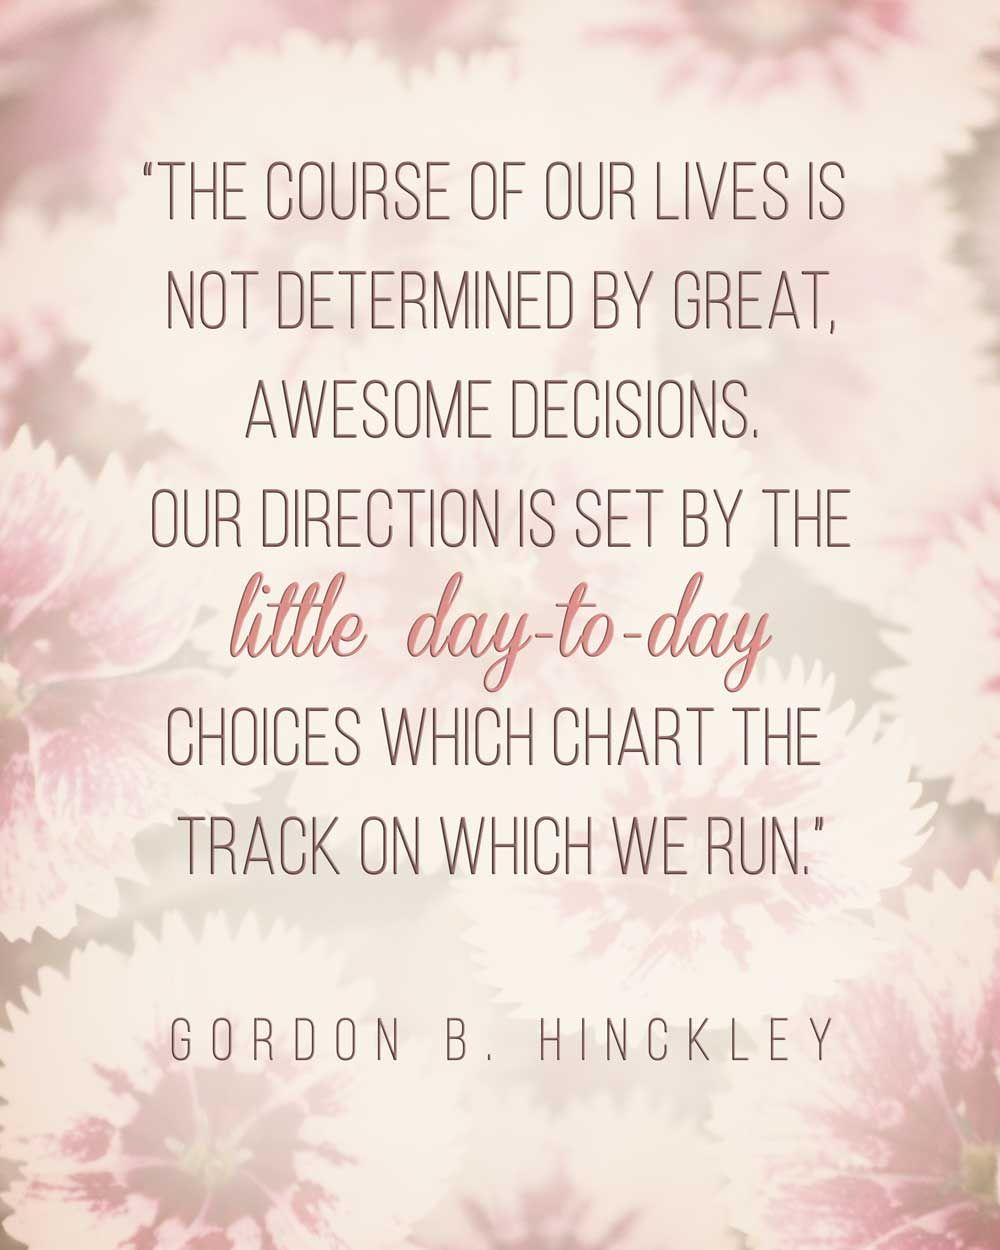 Gordon B. Hinckley LDS Quote #goals #motivation http://sprinklesonmyicecream.blogspot.com/